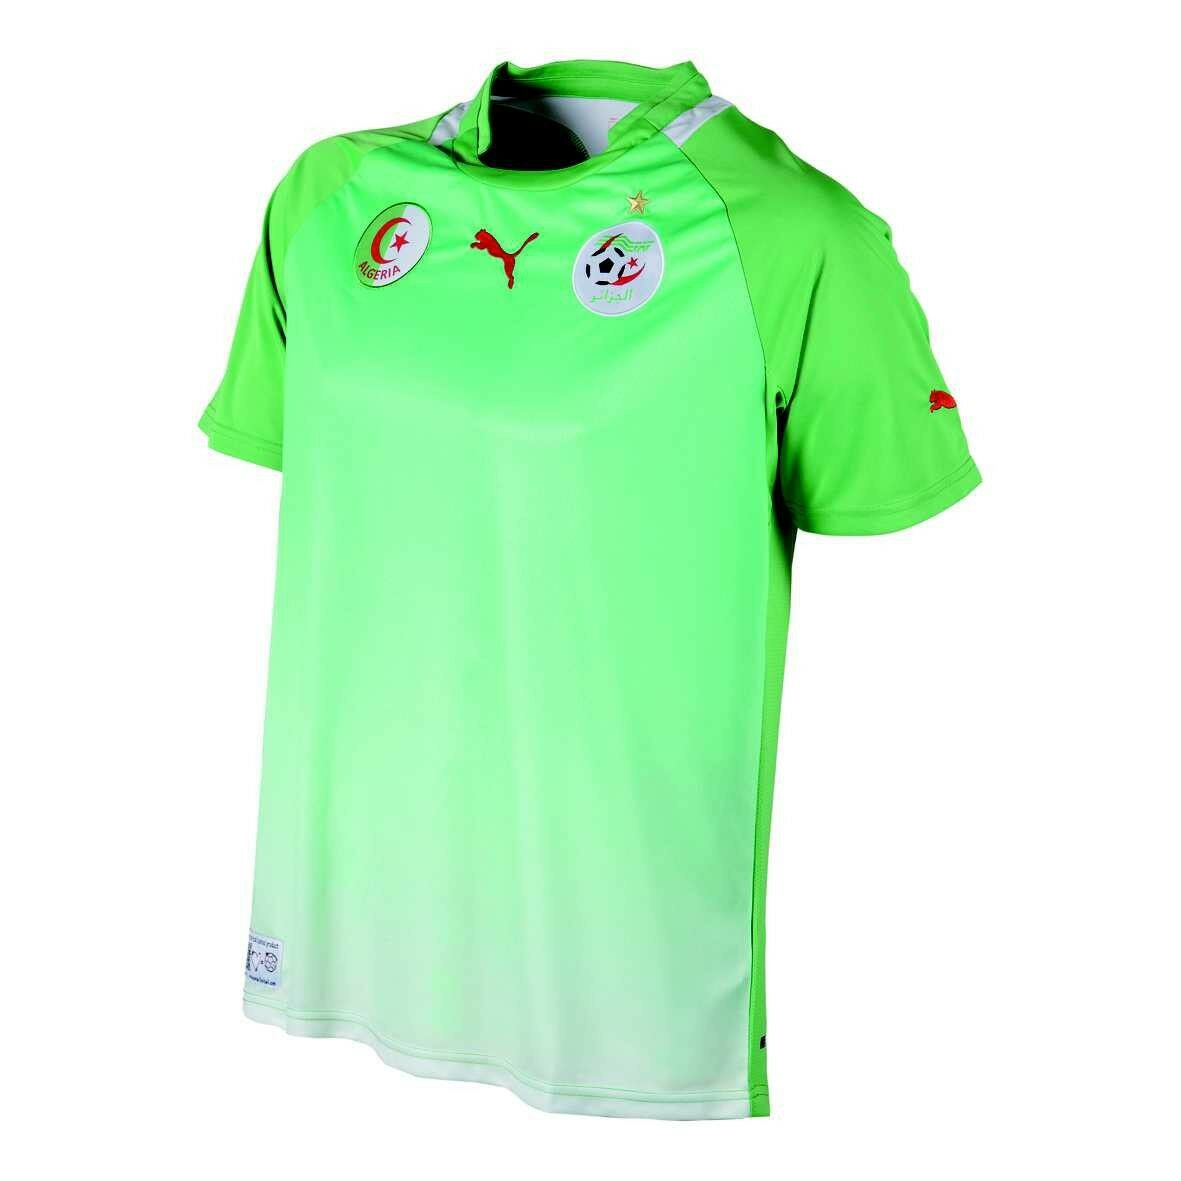 Puma Argelia Fuera Camiseta Replica Jersey de Hombre Dimensione L Jersey 740203 01